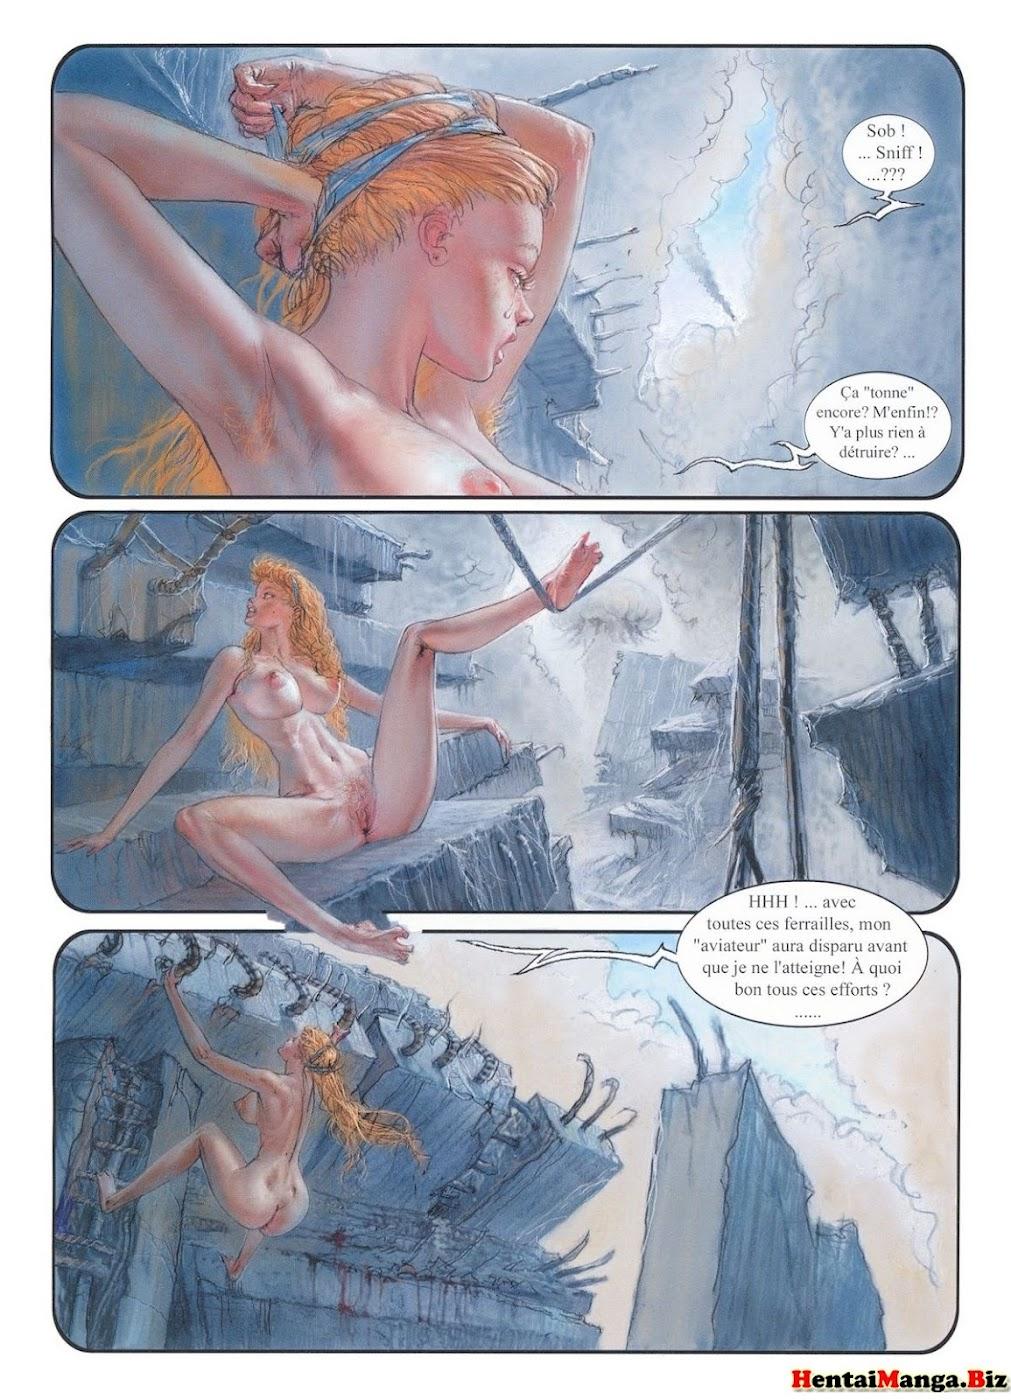 Hentai Manga - Evy (French)-Read-Hentai-Manga-Onlnie